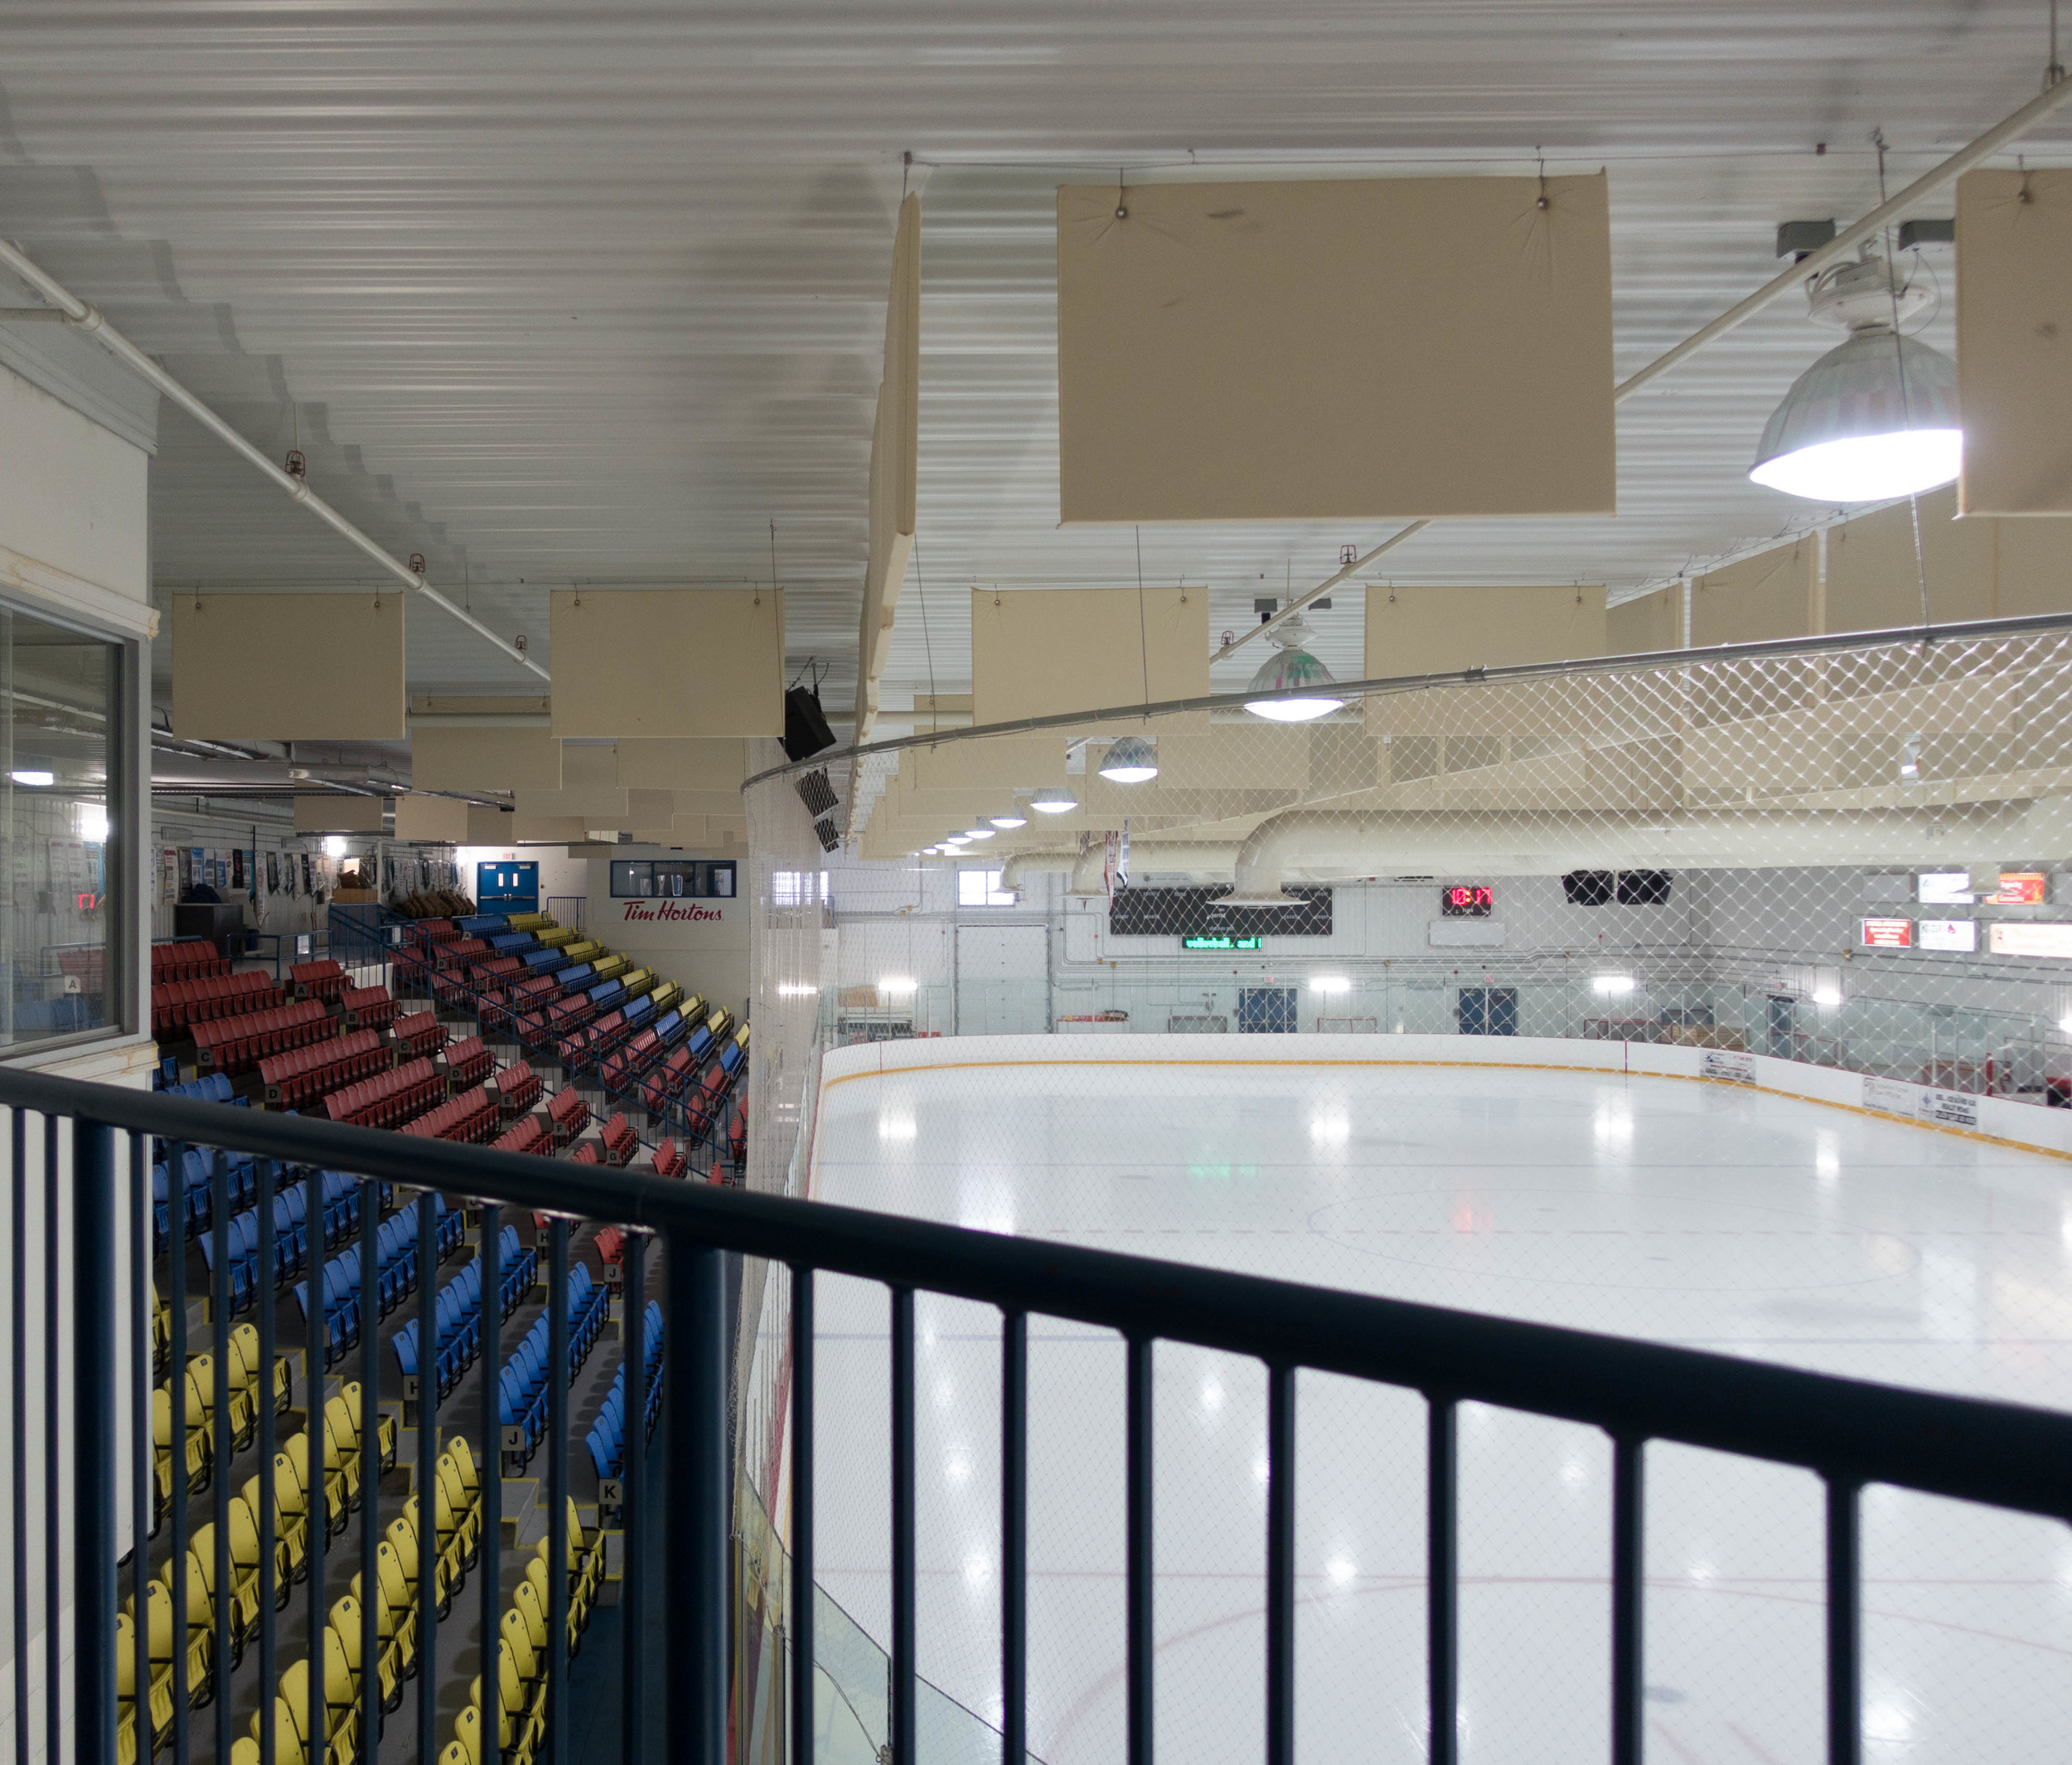 arena-seats.jpg